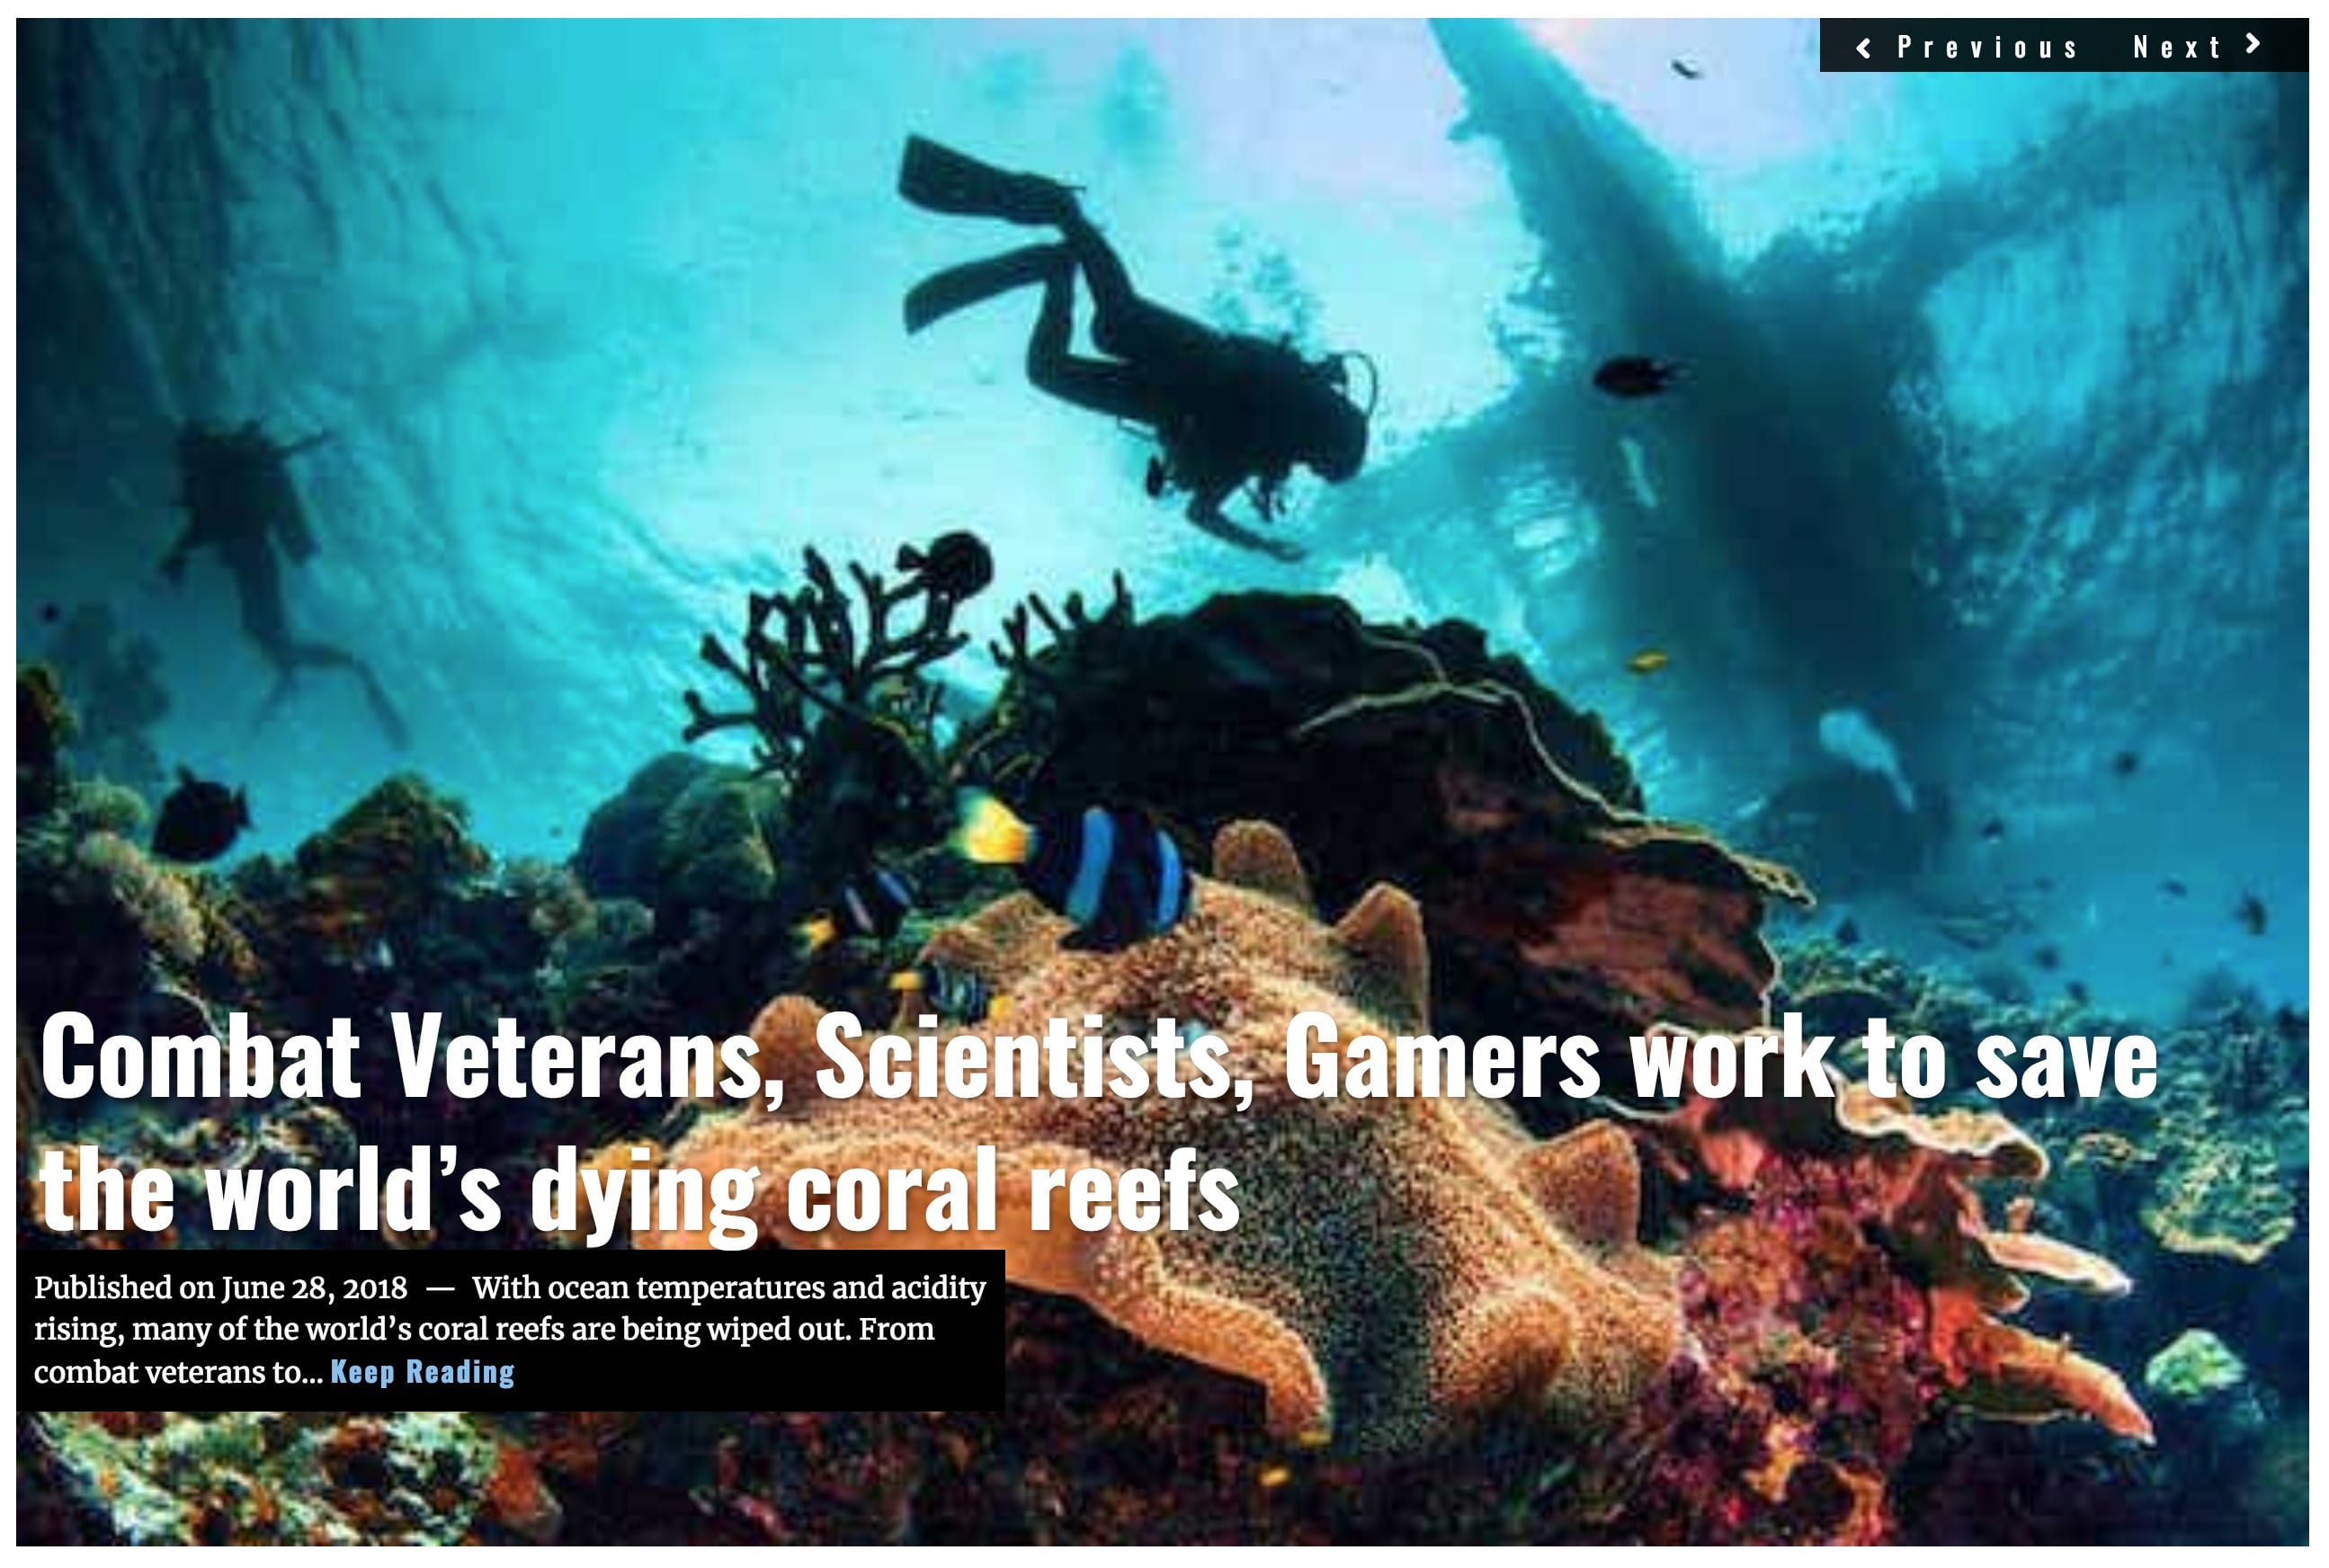 Image Lima Charlie News Headline Combat Veterans Coral Reefs